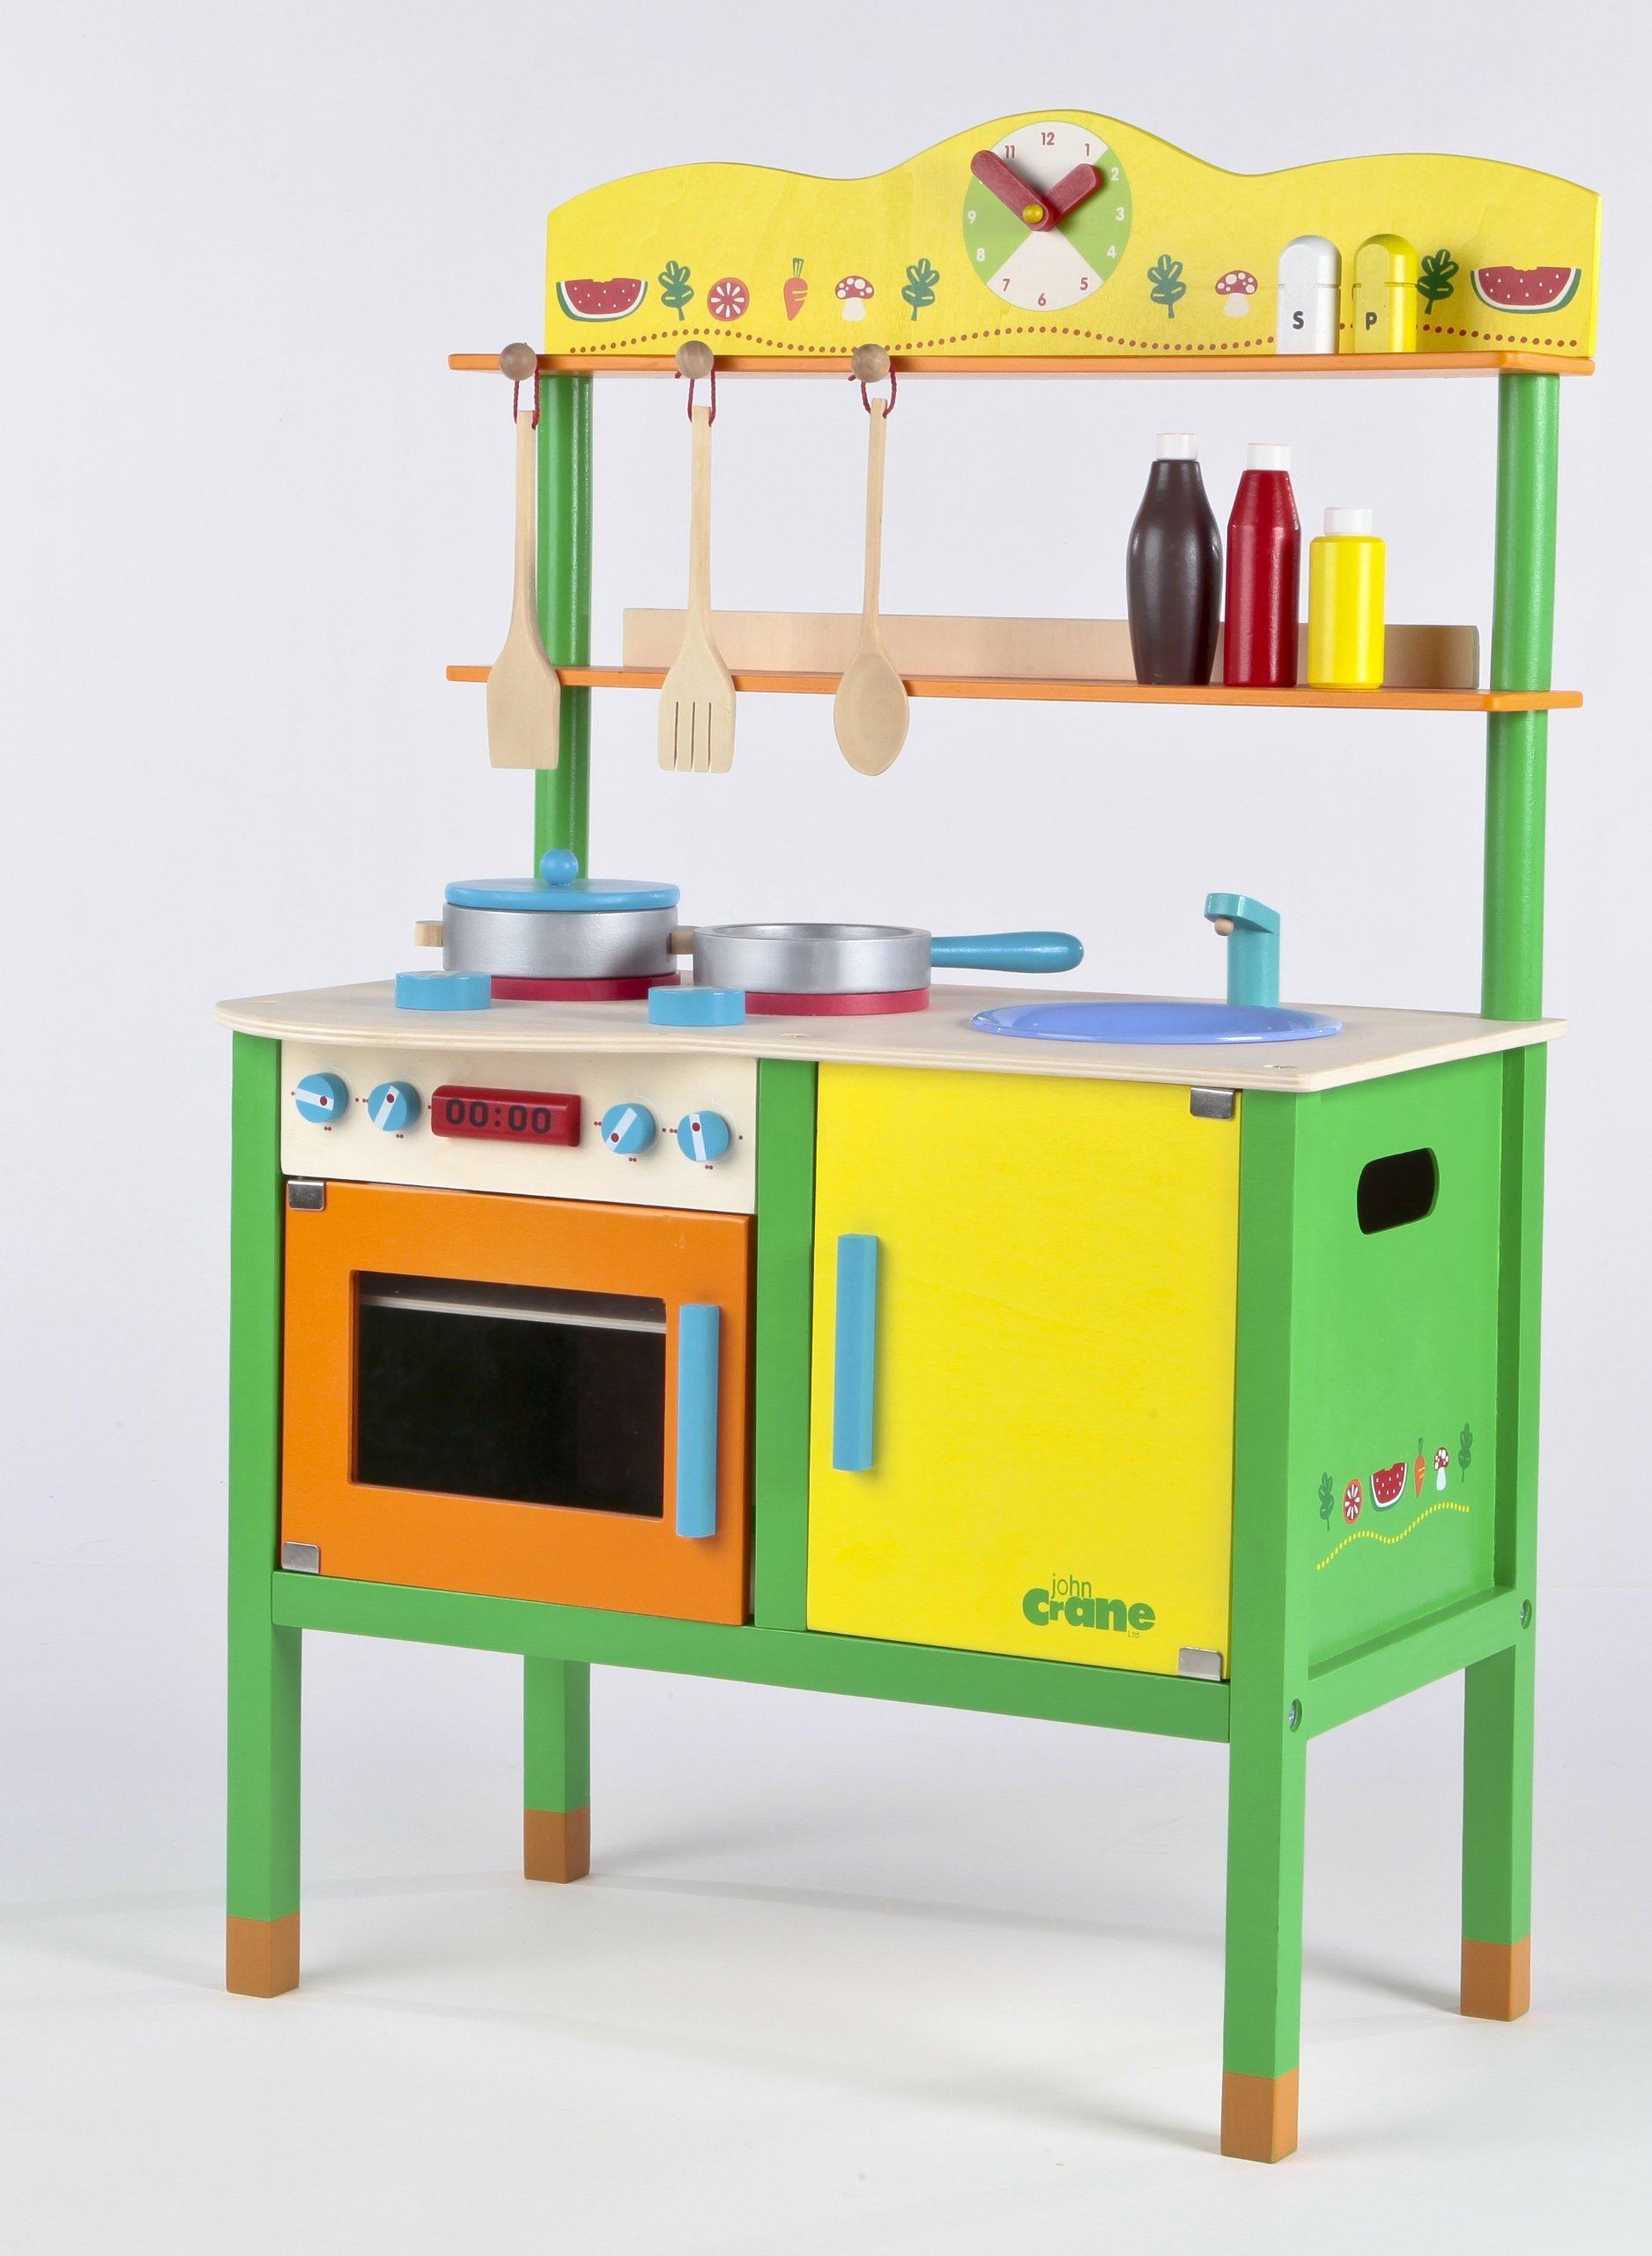 Tidlo Petite Cuisine Play Kitchen